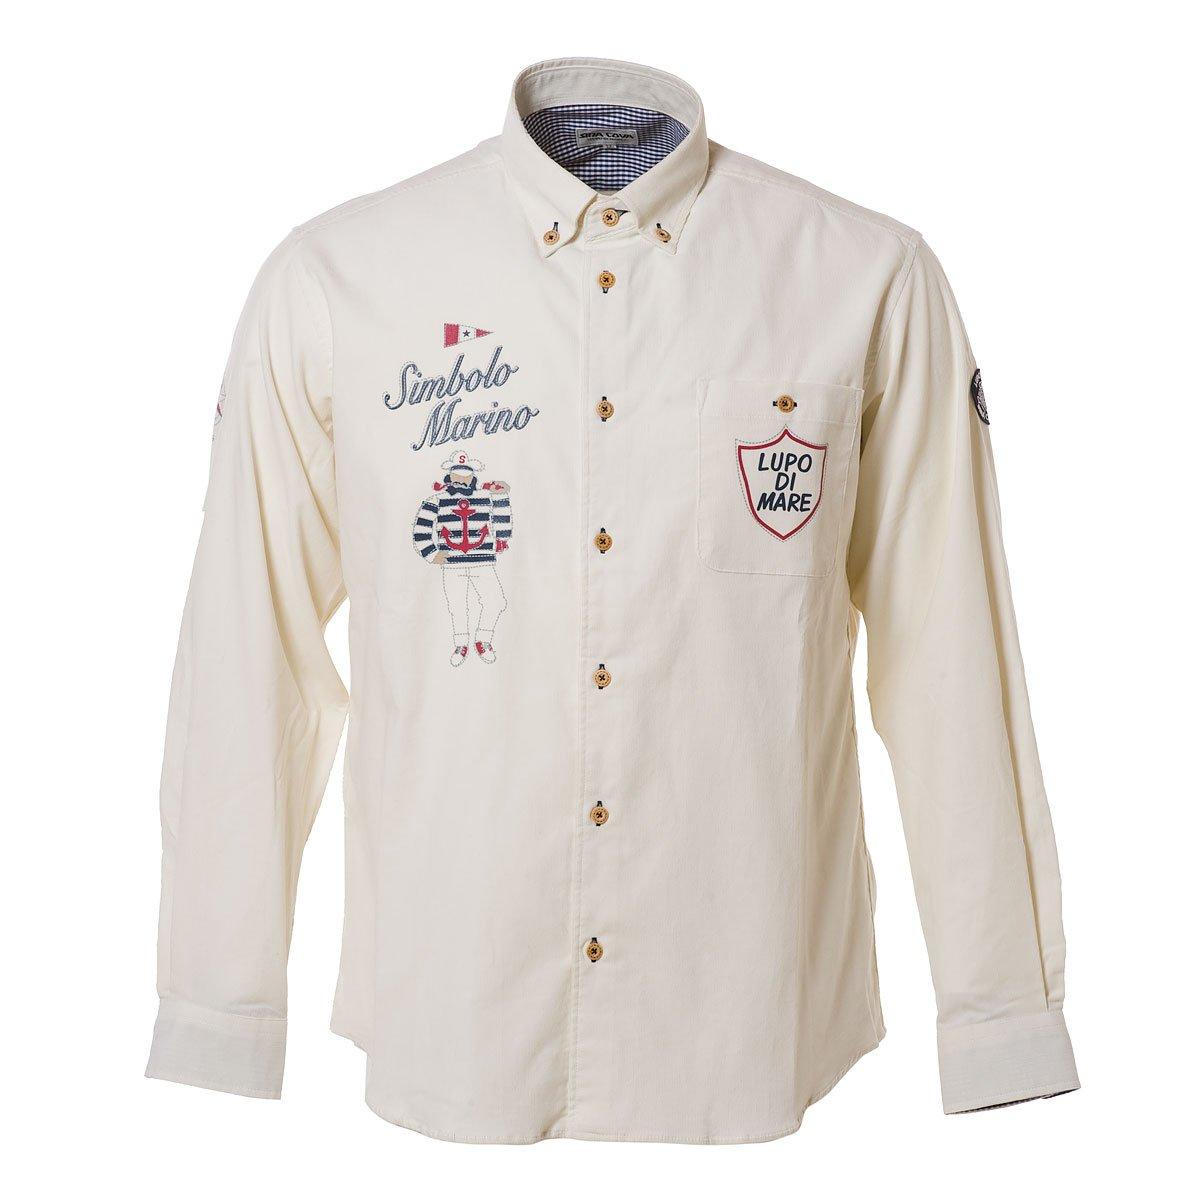 SINA COVA SINACOVA Men's Long Sleeve Shirt Off-White Large